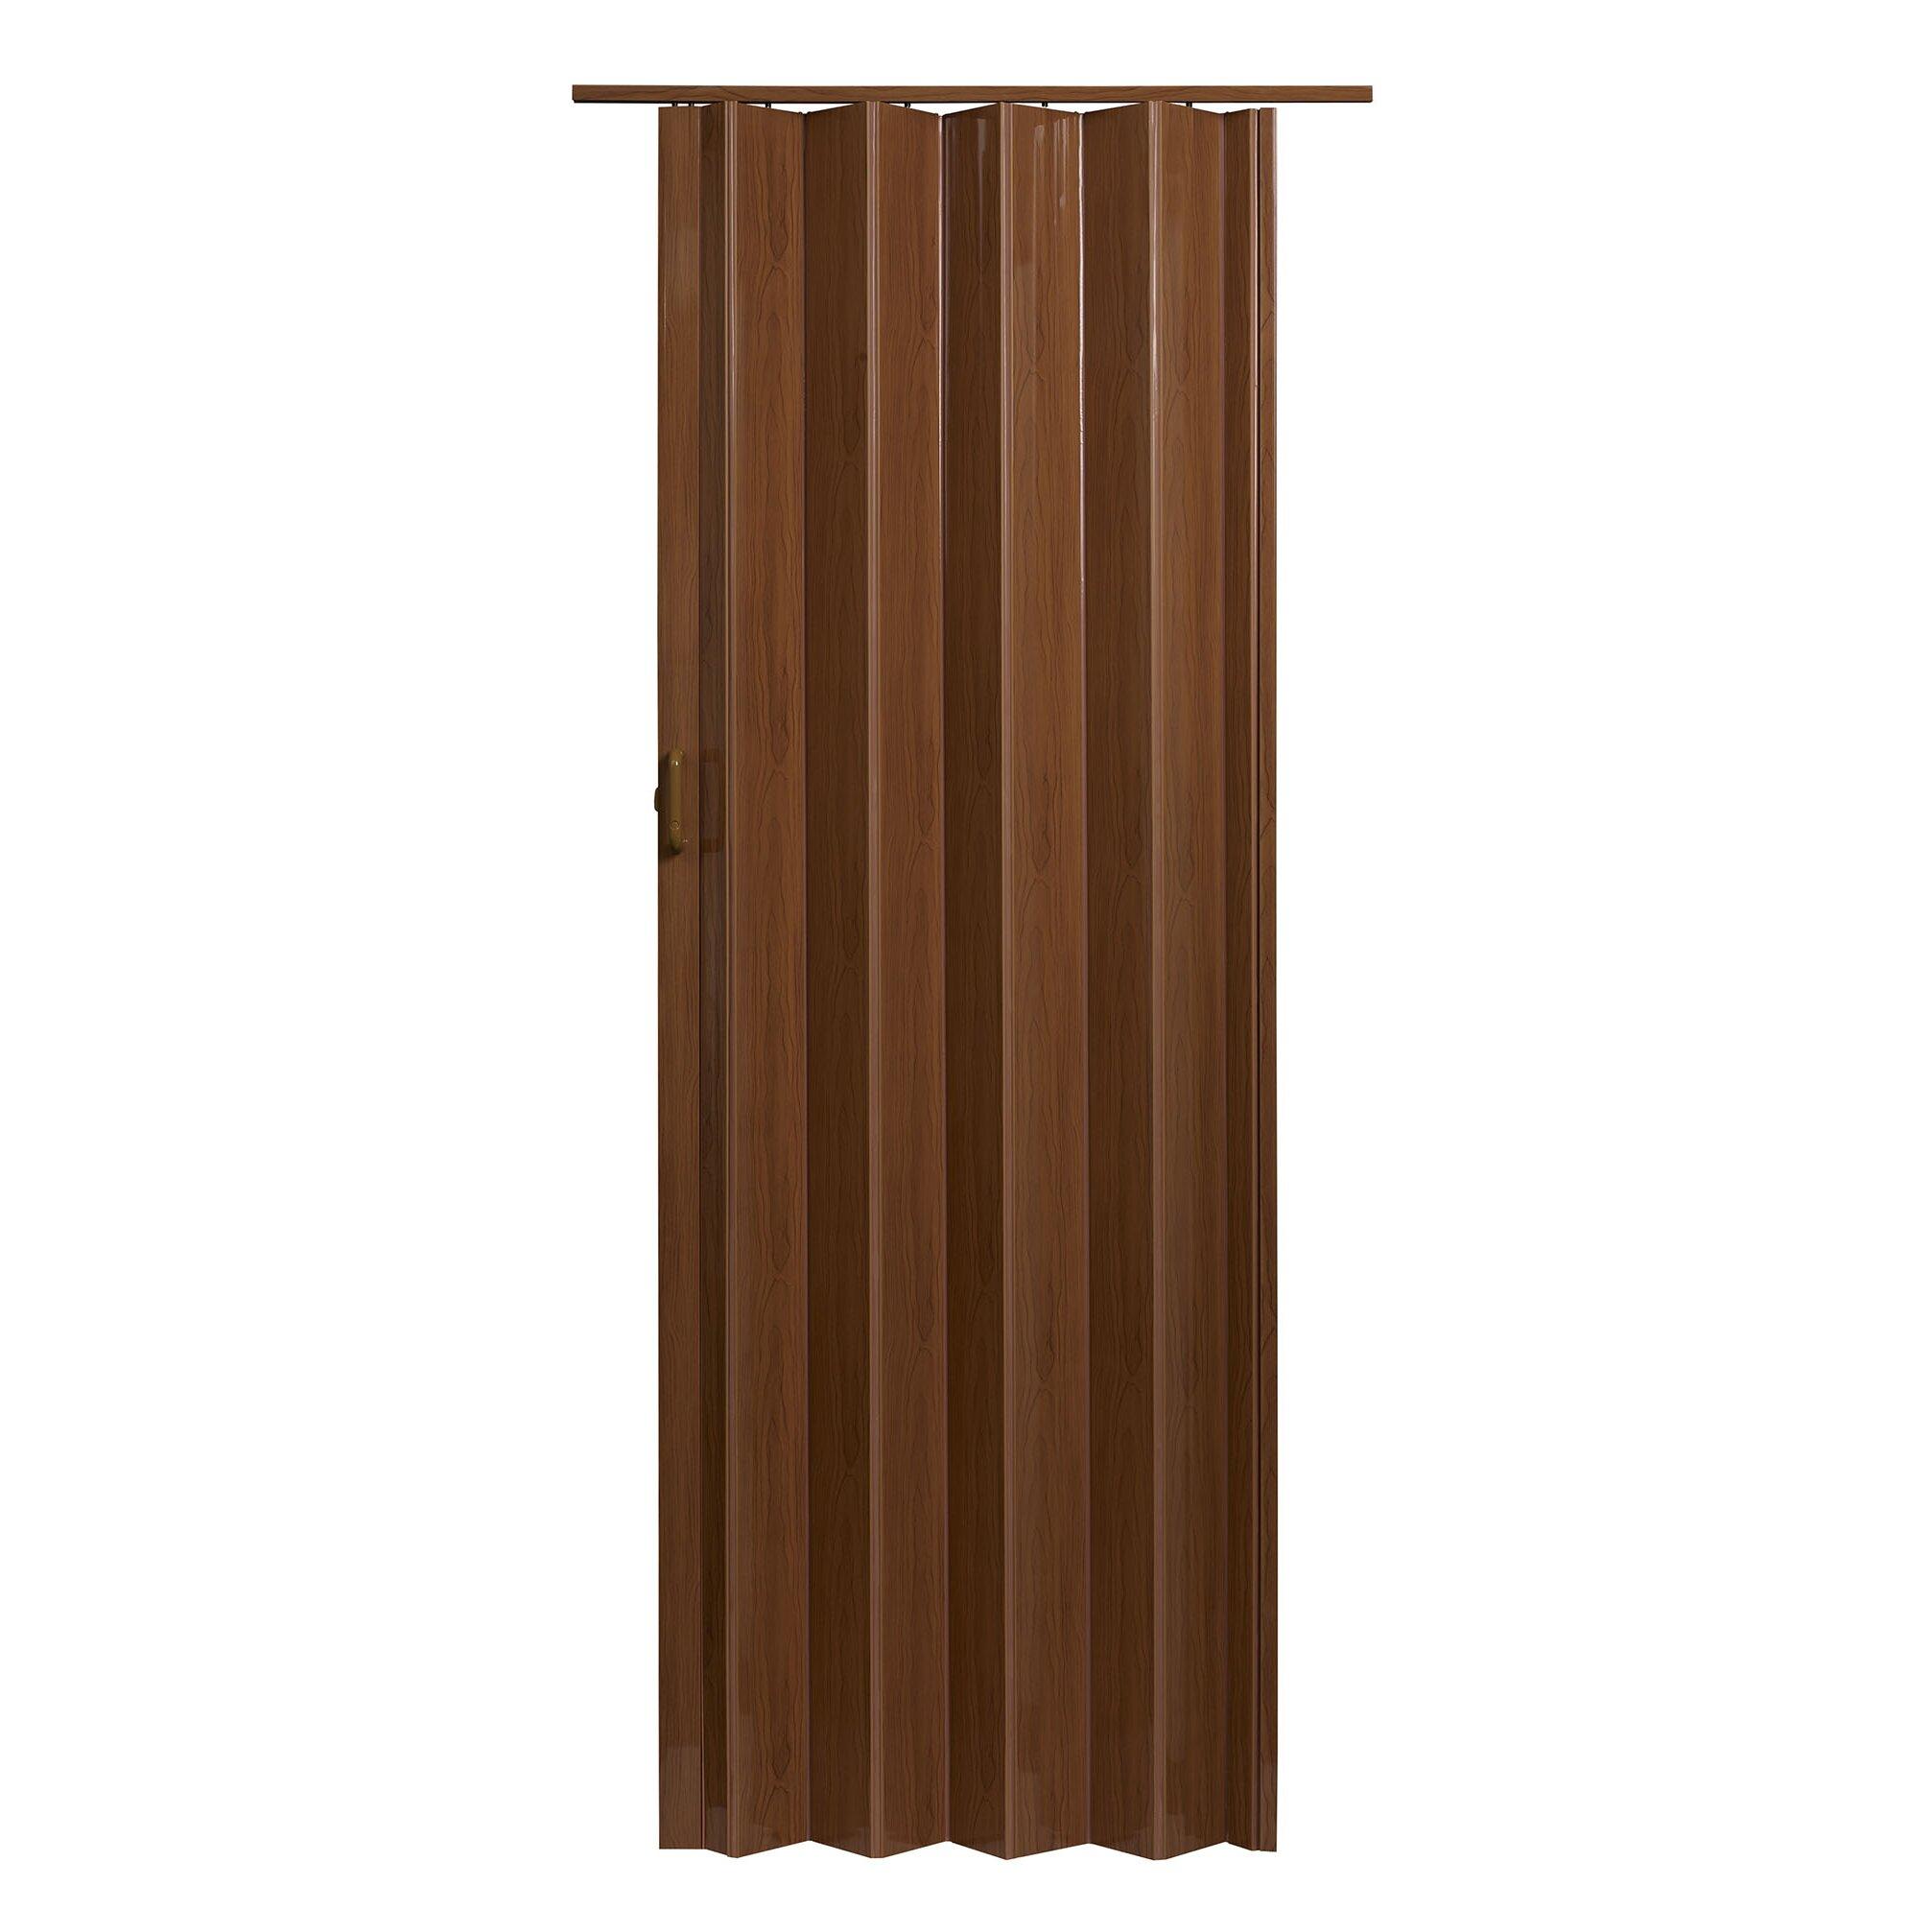 Vinyl Folding Doors : Ltl accordion doors homestyle vinyl interior